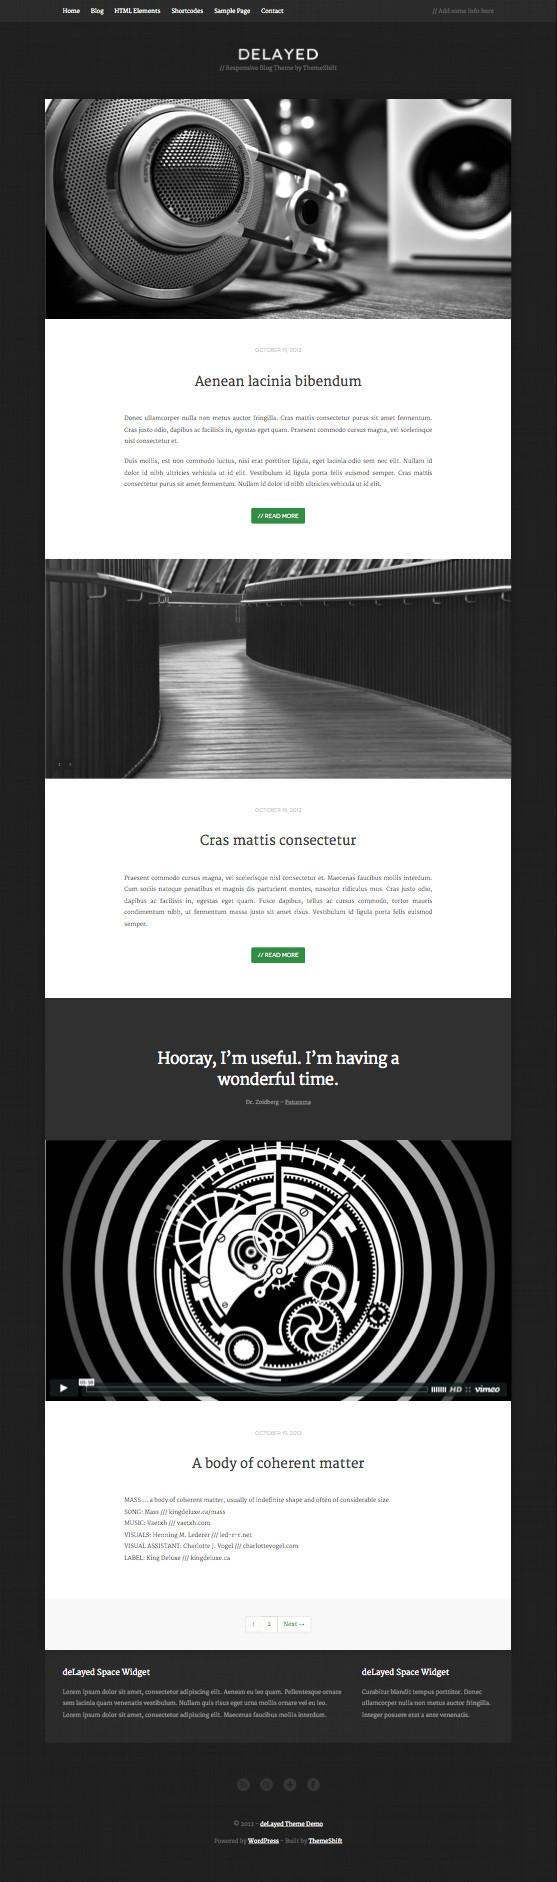 deLayed WordPress Minimal Theme